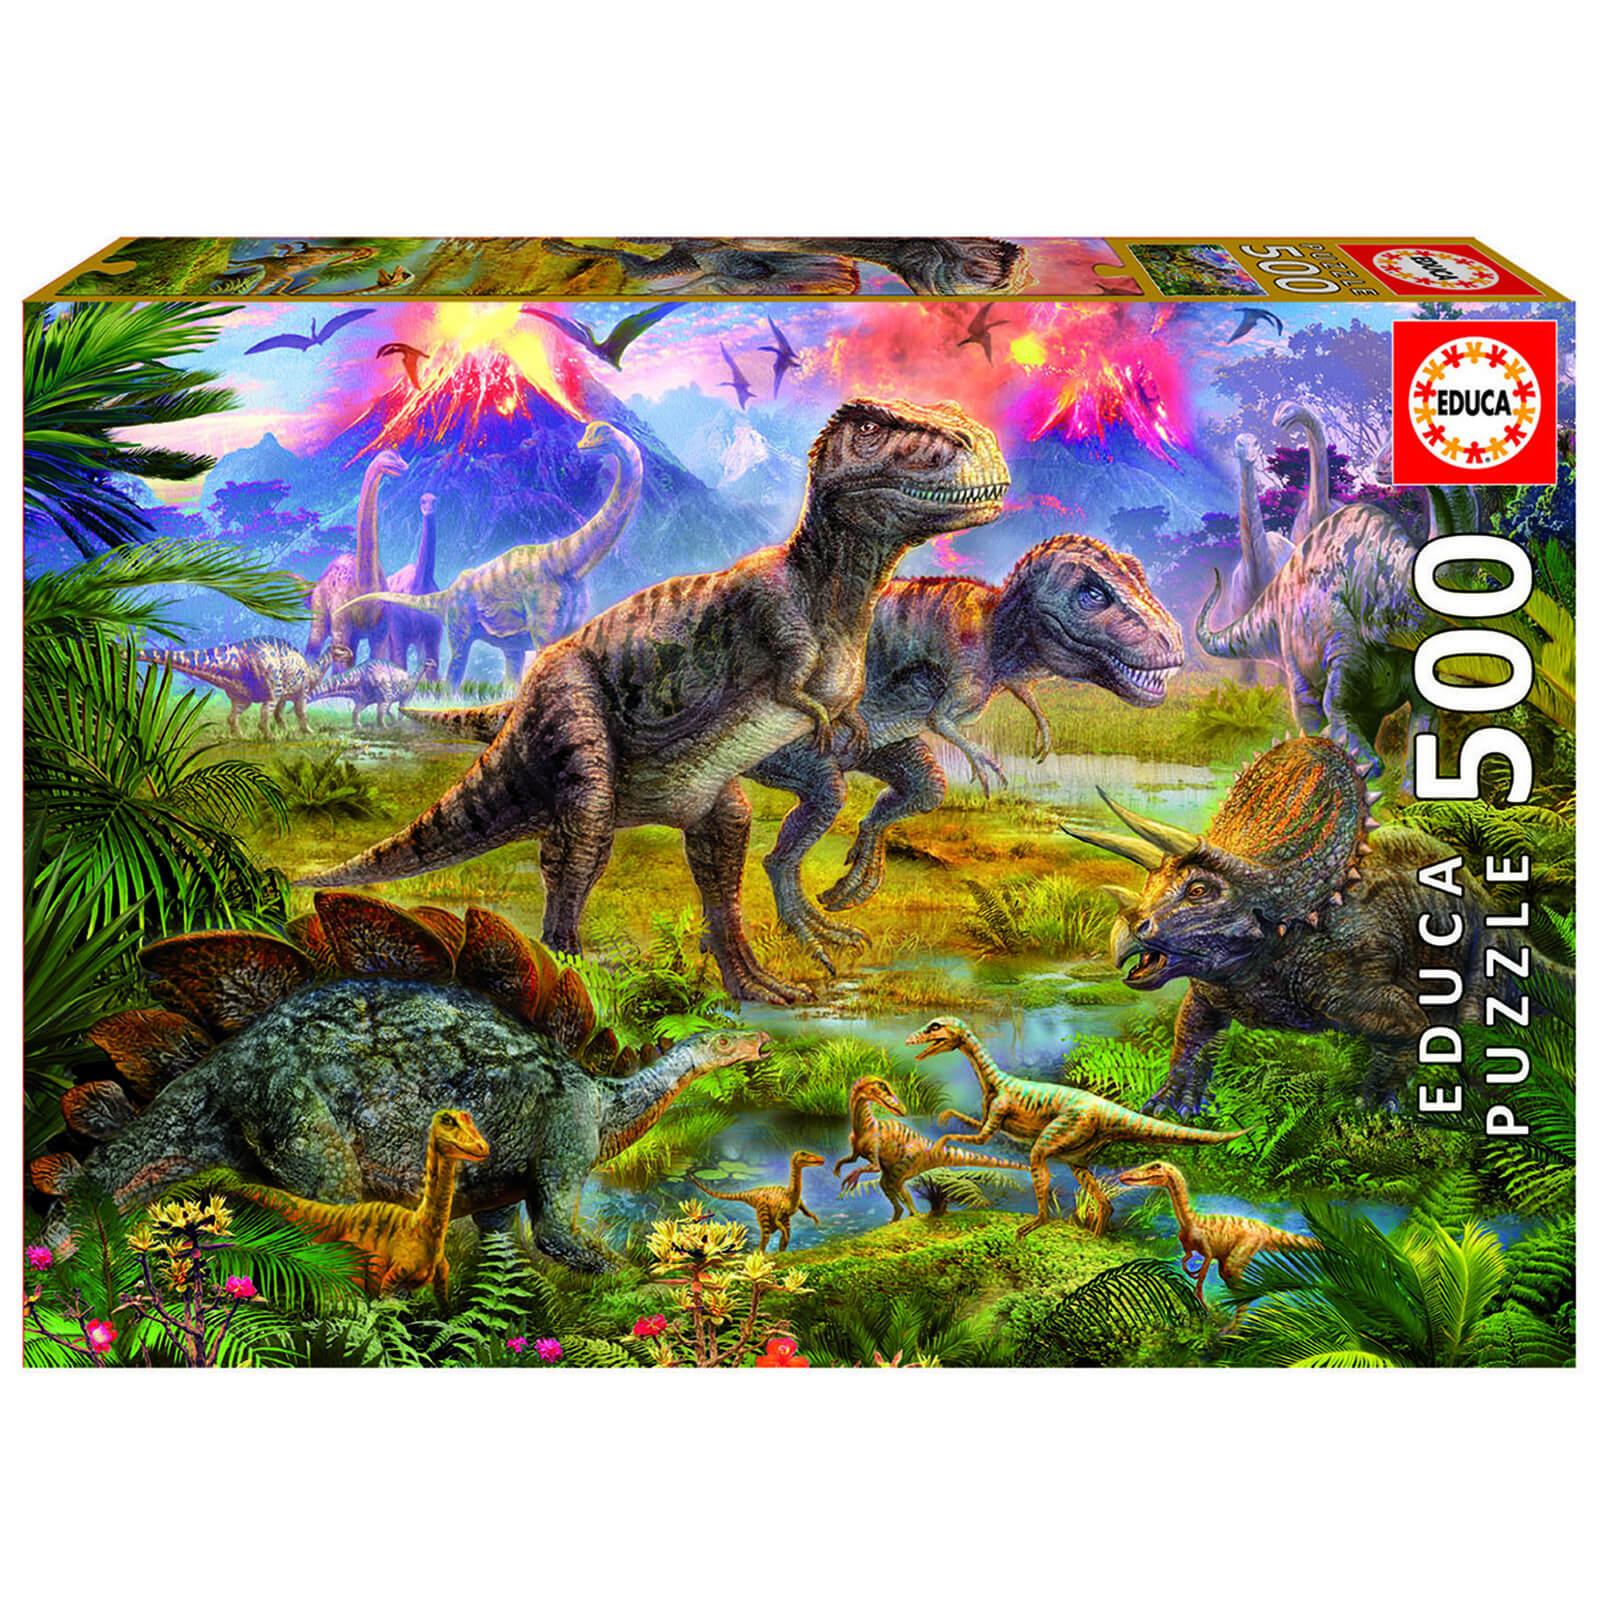 Paul Lamond Games Dinosaur Gathering Jigsaw Puzzle (500 Pieces)-unisex